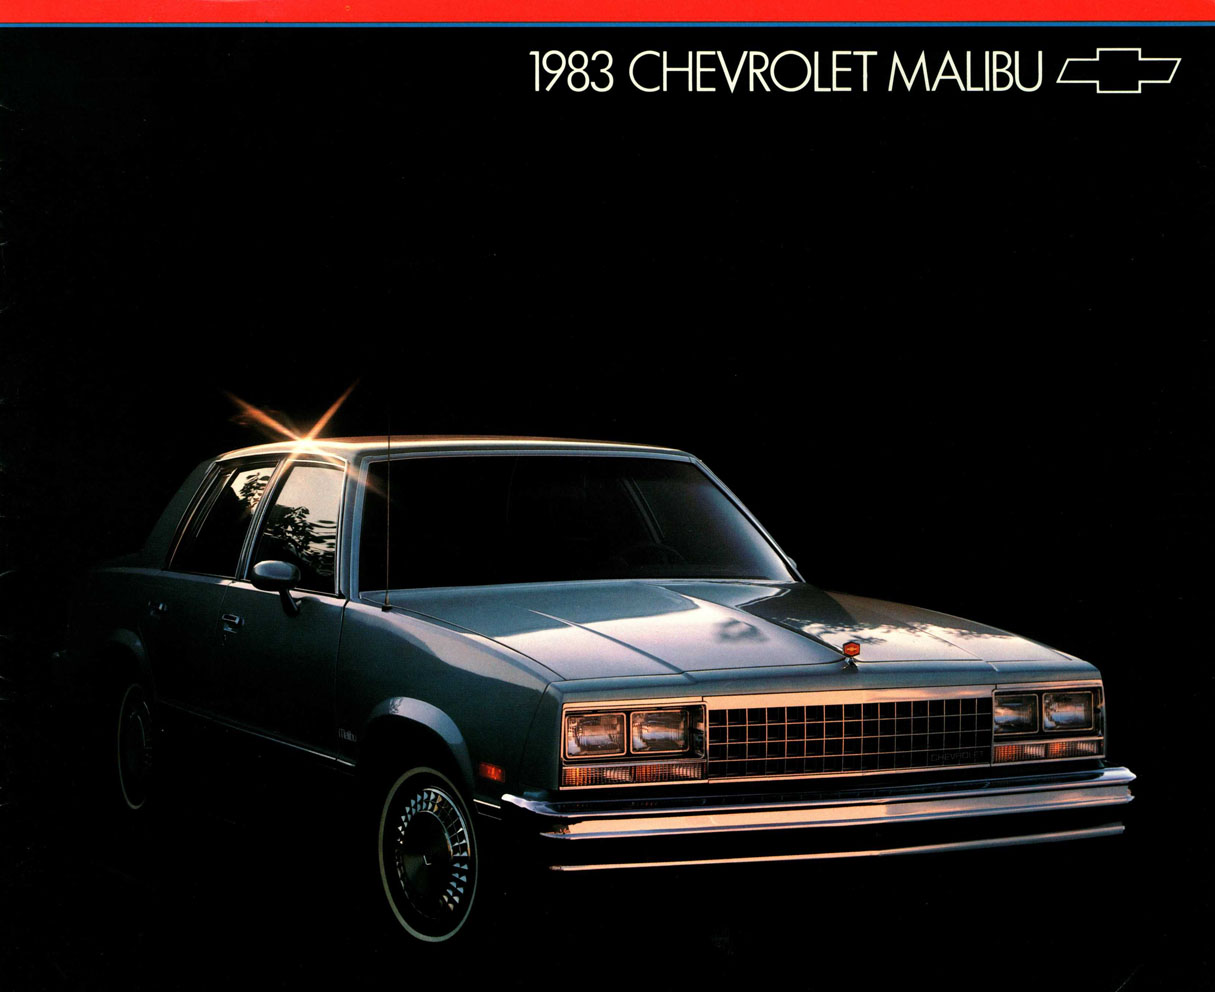 1983 Malibu OEM Brochure (1)